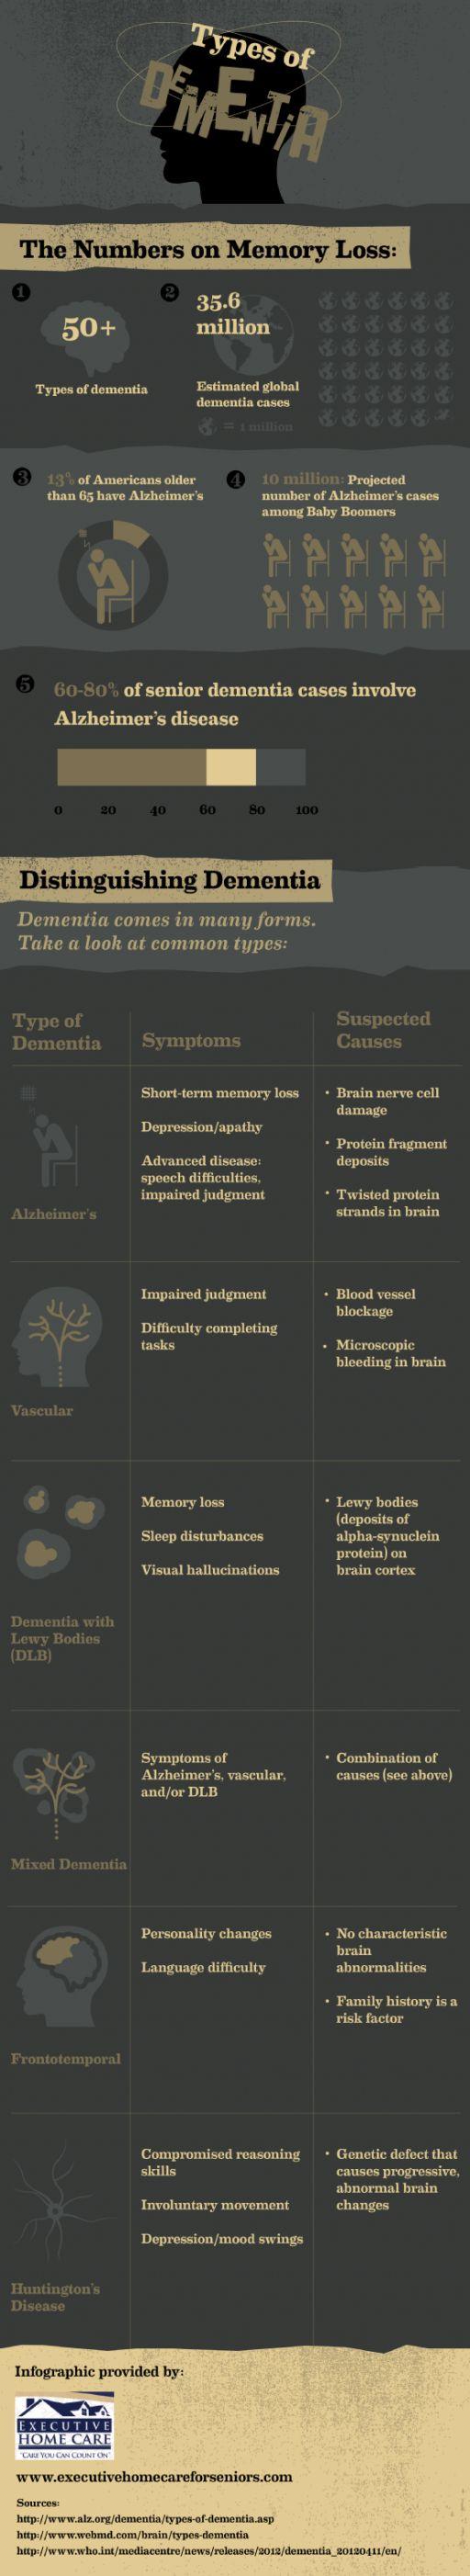 Types of Dementia #caregiver #caregiver #dads